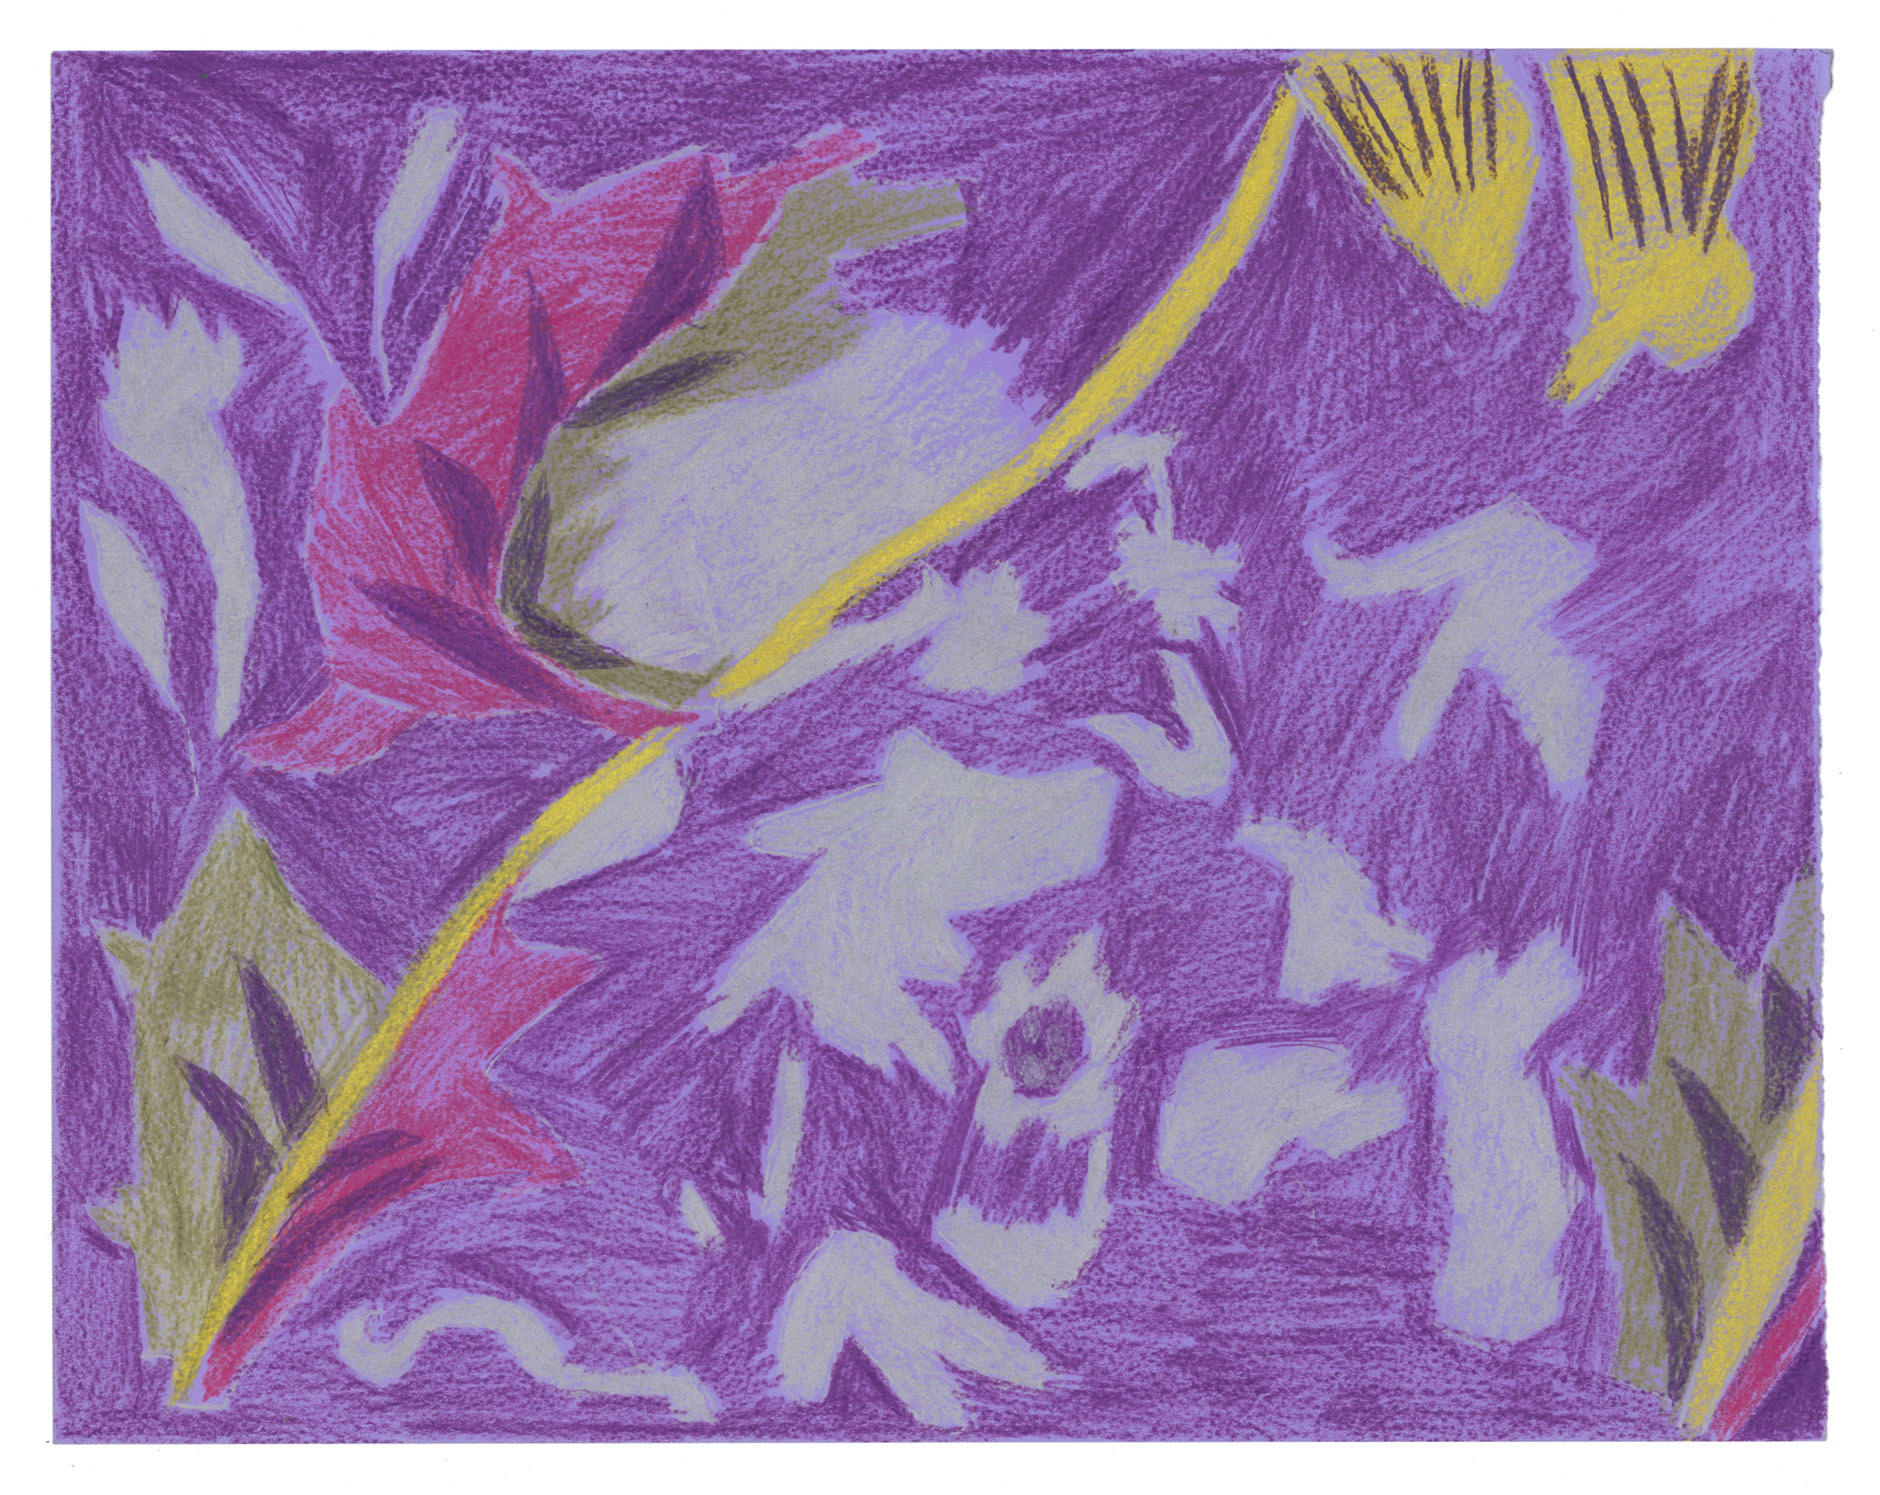 Mawuena Kattah, Purple Fabric, 2014